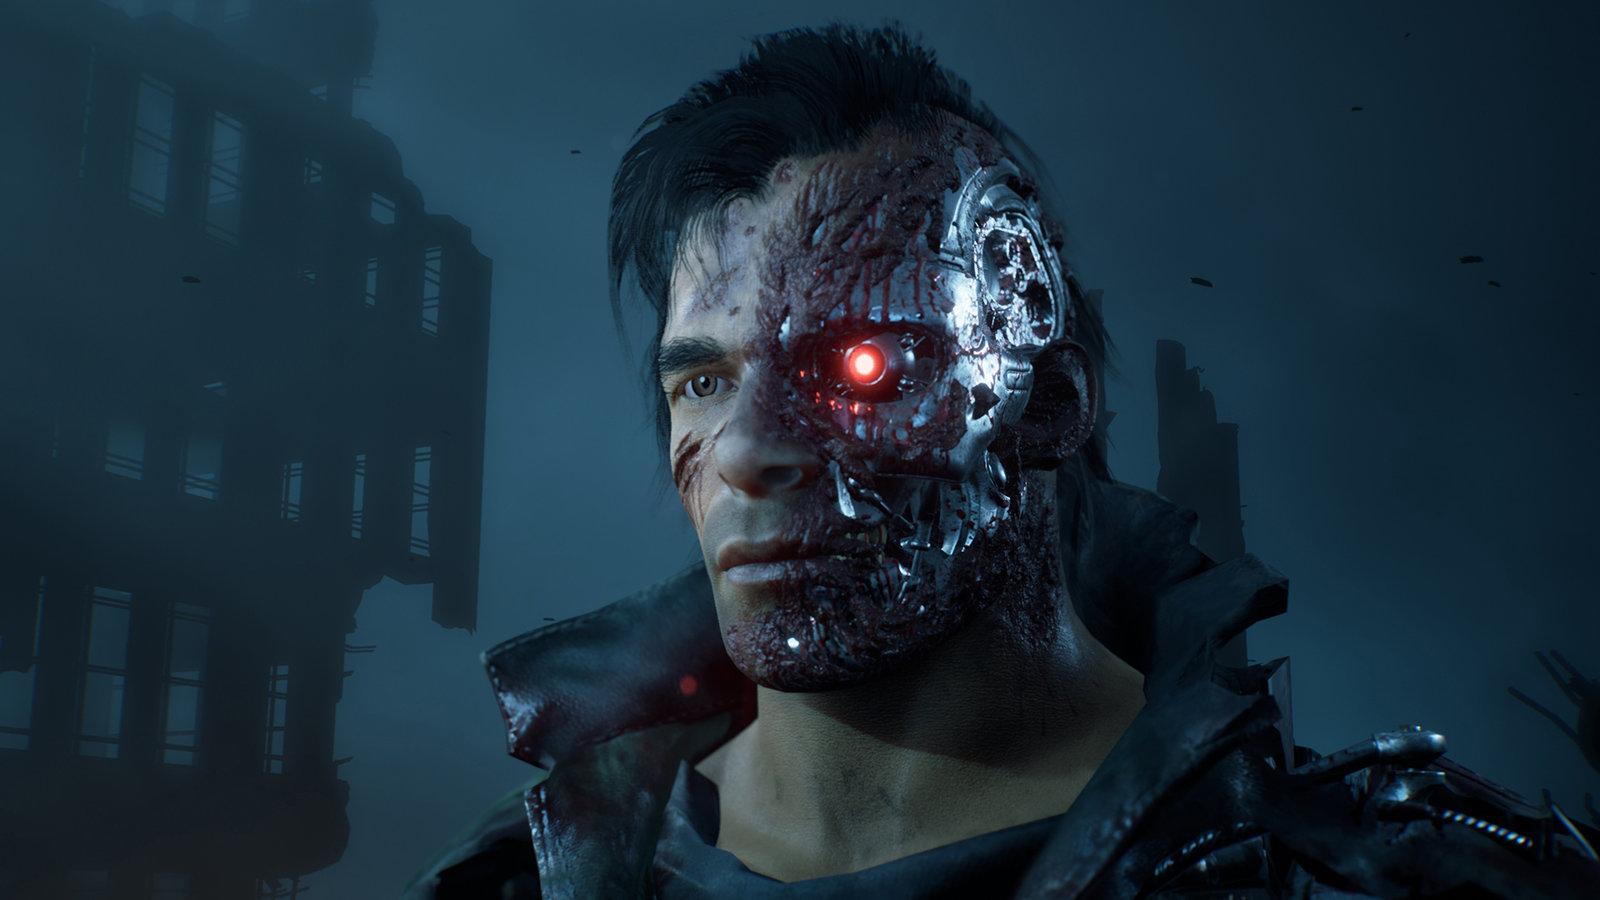 Terminator Resistance Infiltrator image 1